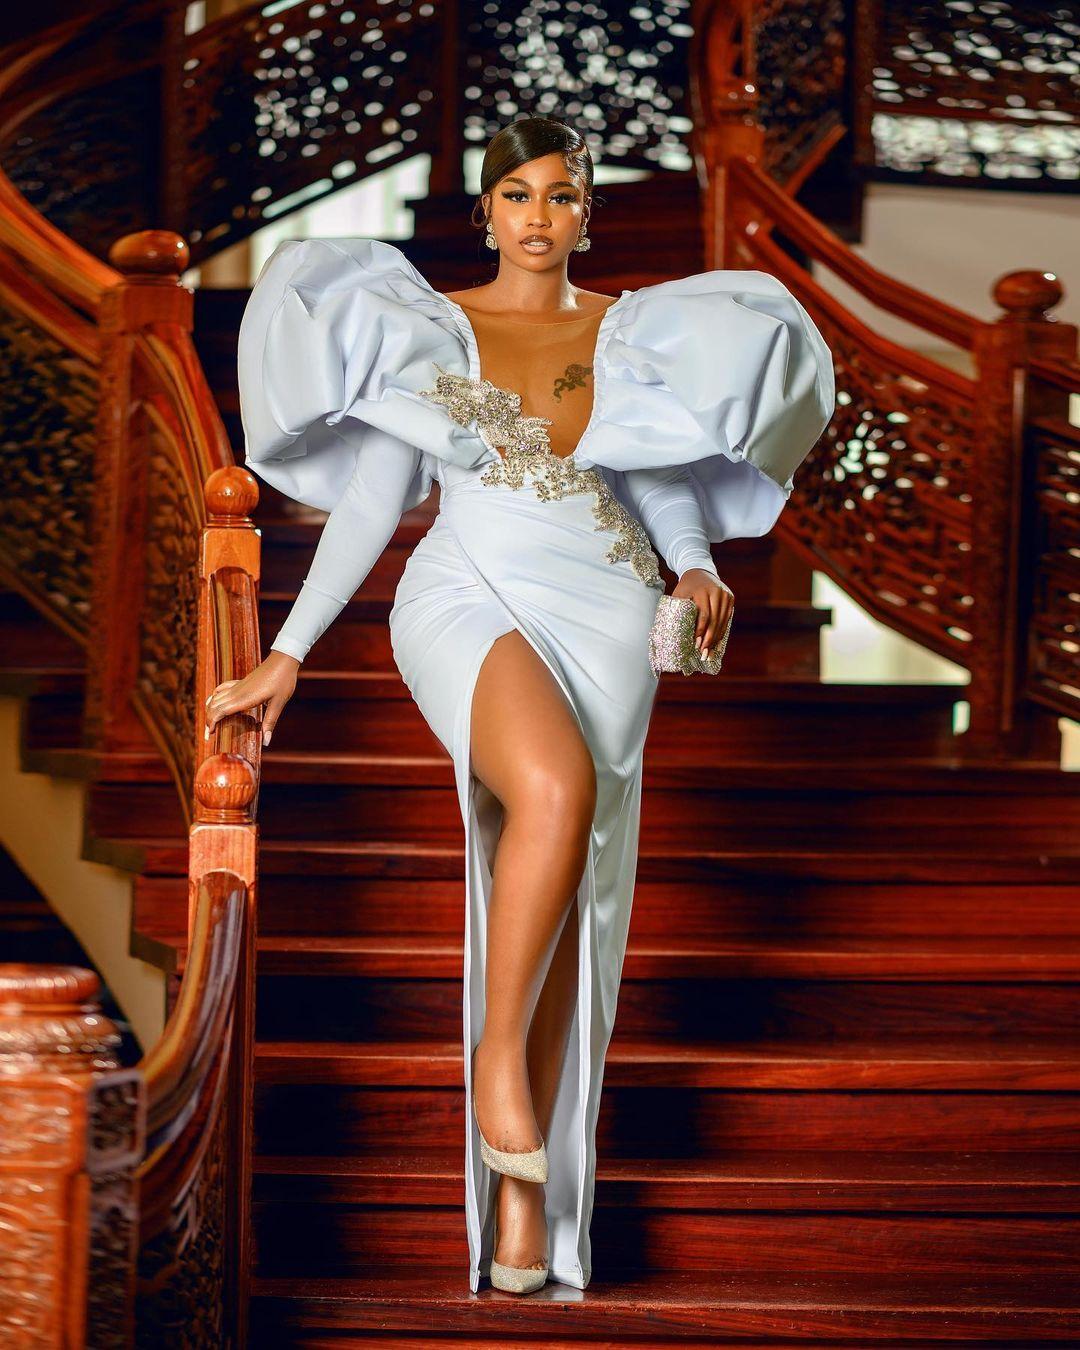 entrancing-was-the-code-for-last-weeks Female black celebrities